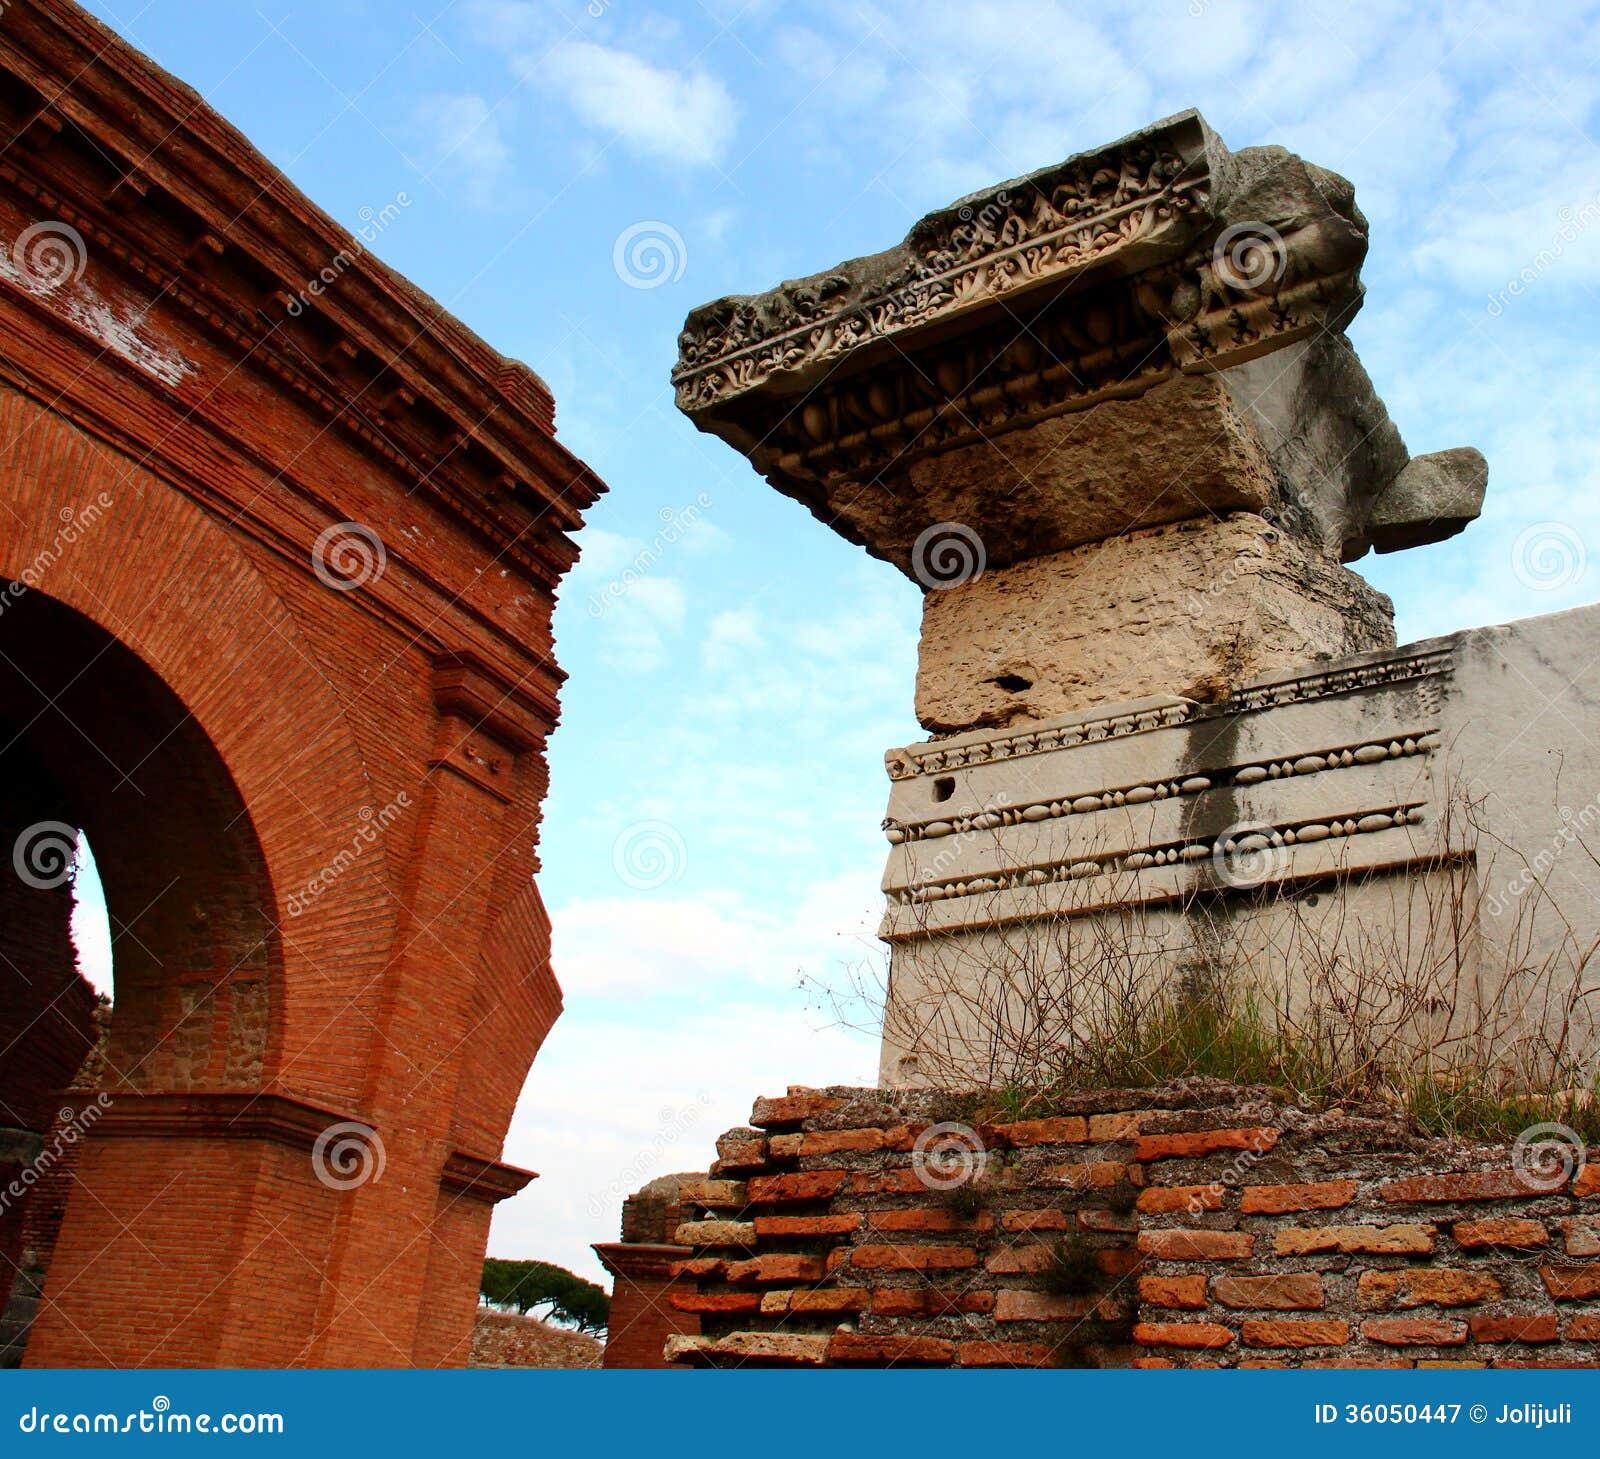 Ostia antica ruins royalty free stock photography image for Mr arredamenti ostia antica